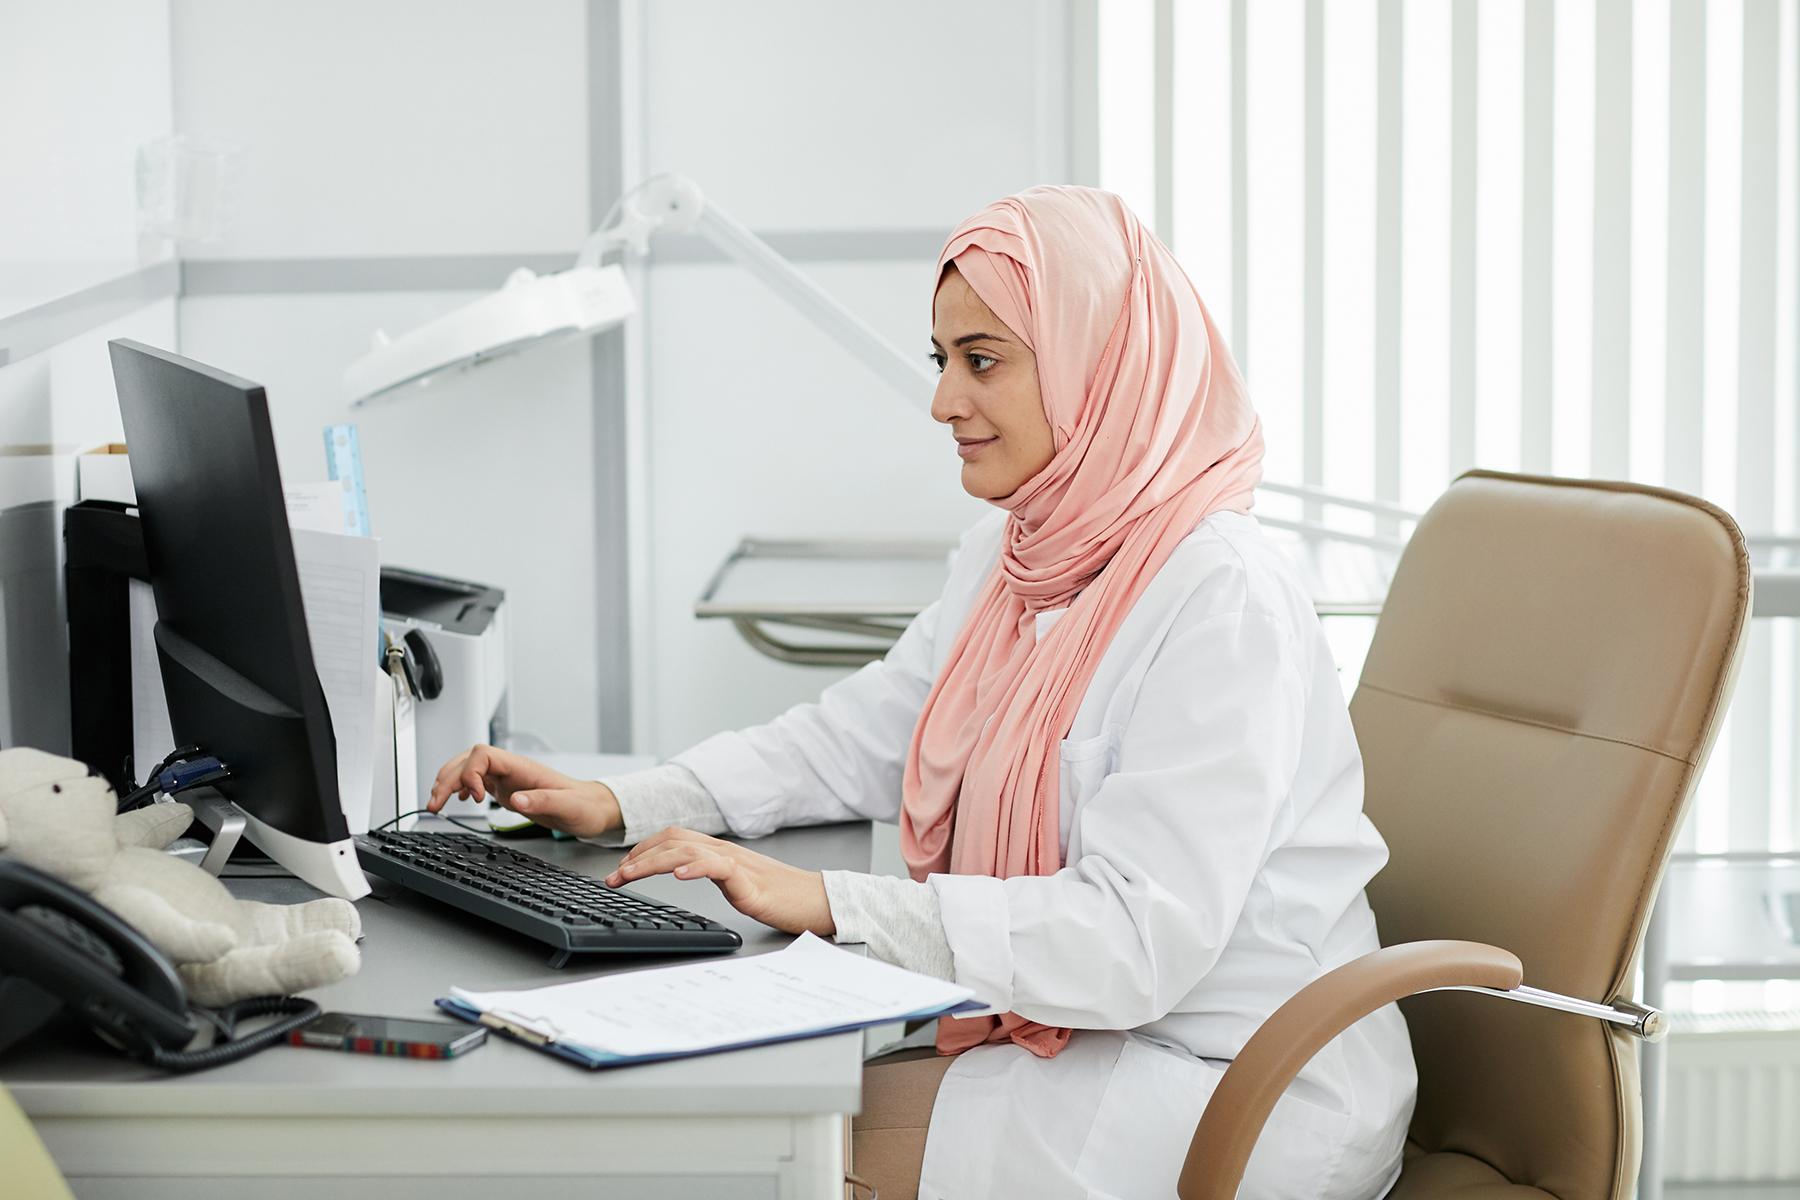 Female doctor in Dubai